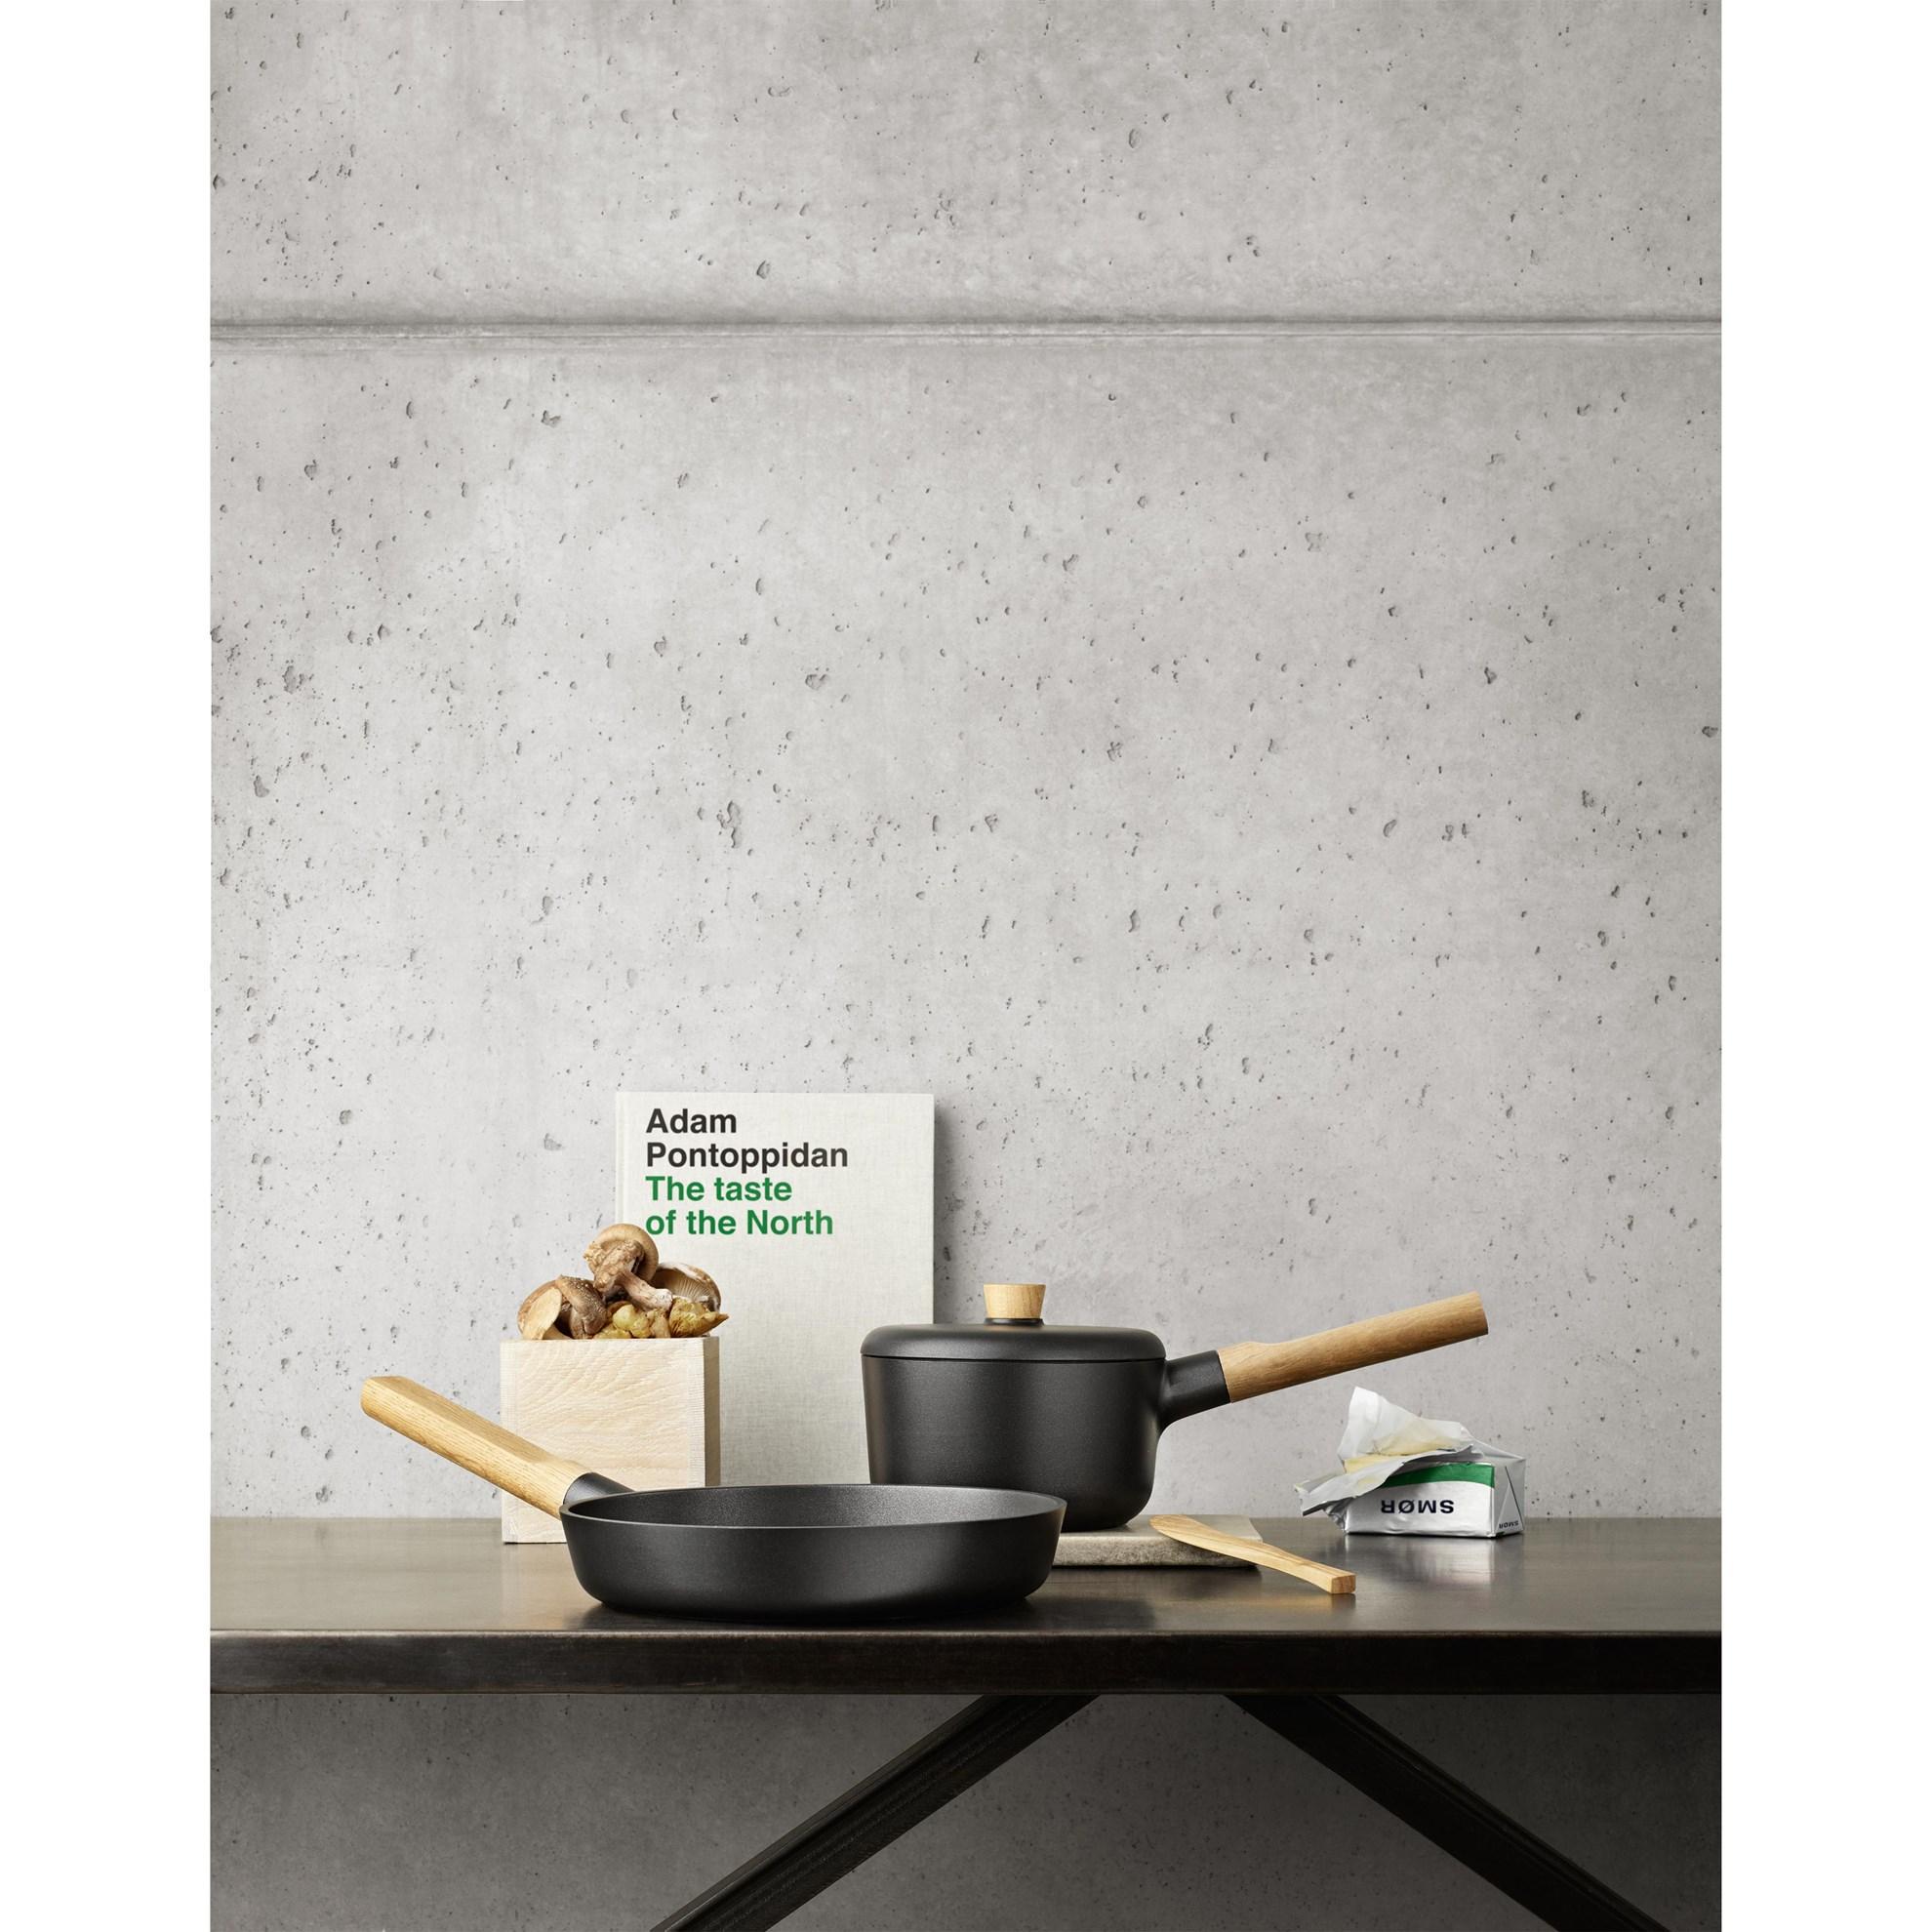 Pánev 28 cm Nordic Kitchen_2